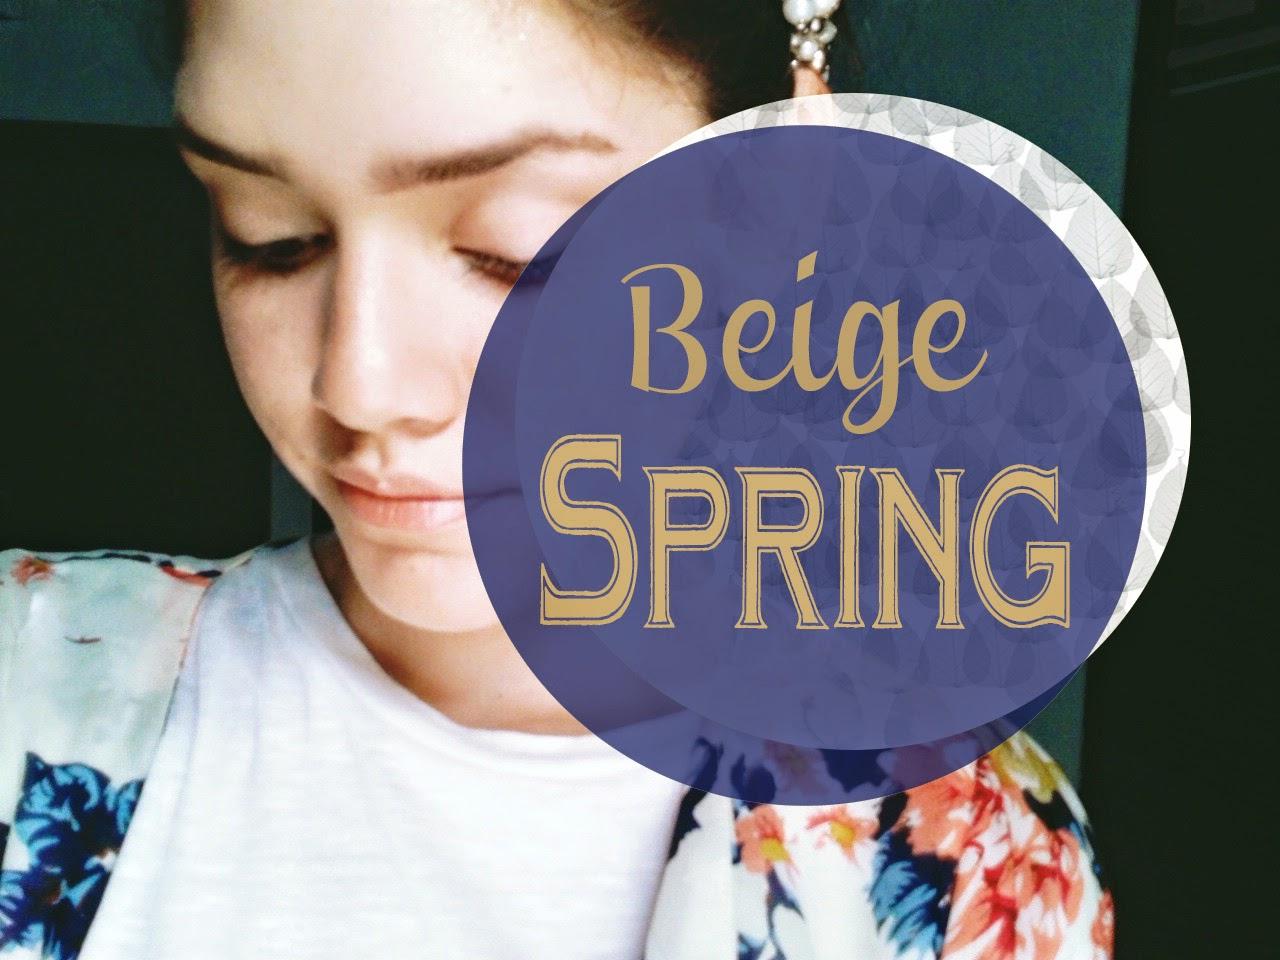 Beige Spring! -387-ursulafl